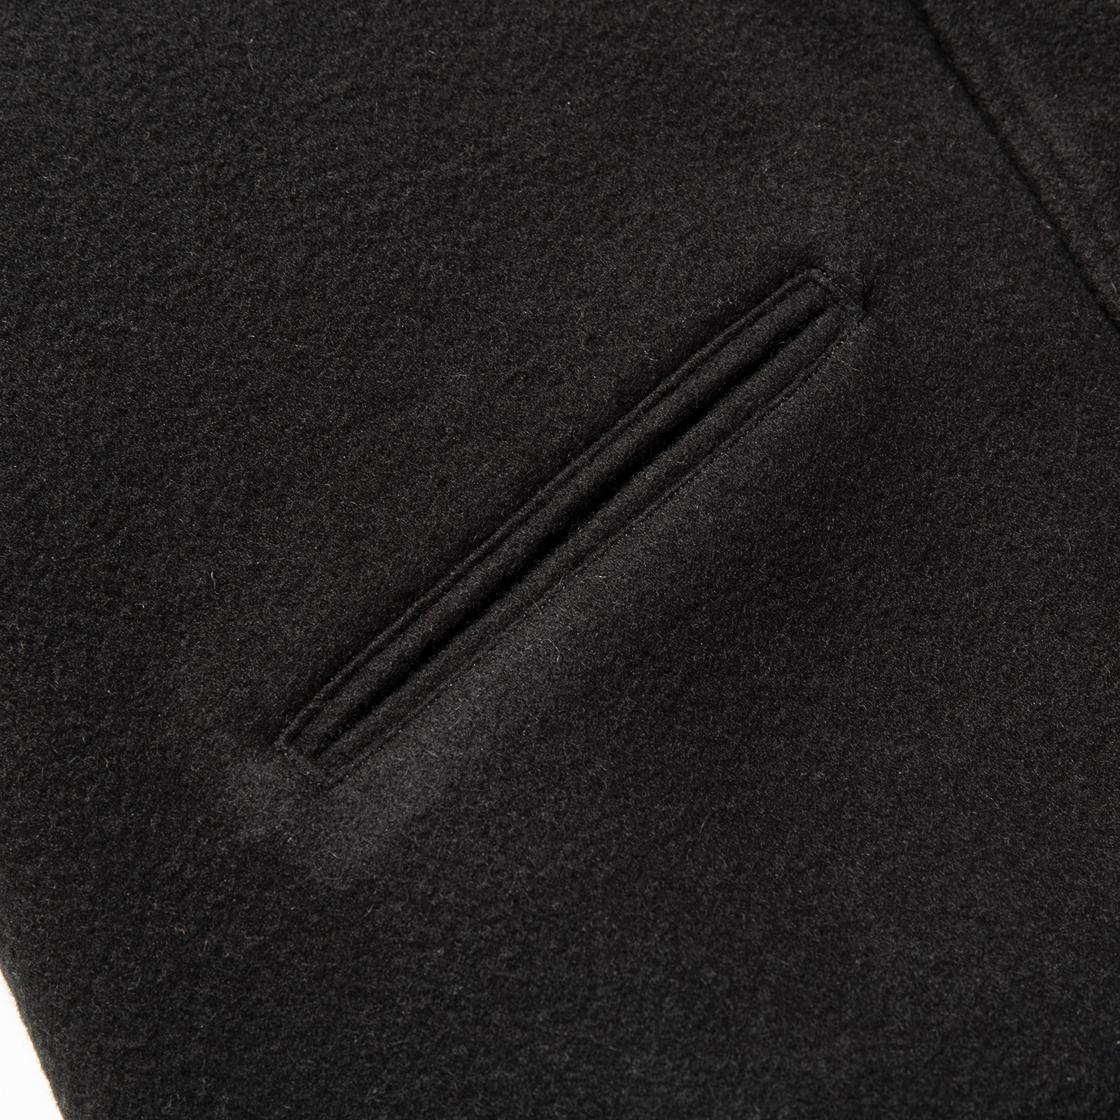 Retro Fleece Melton Varsity Jackets C.Blue